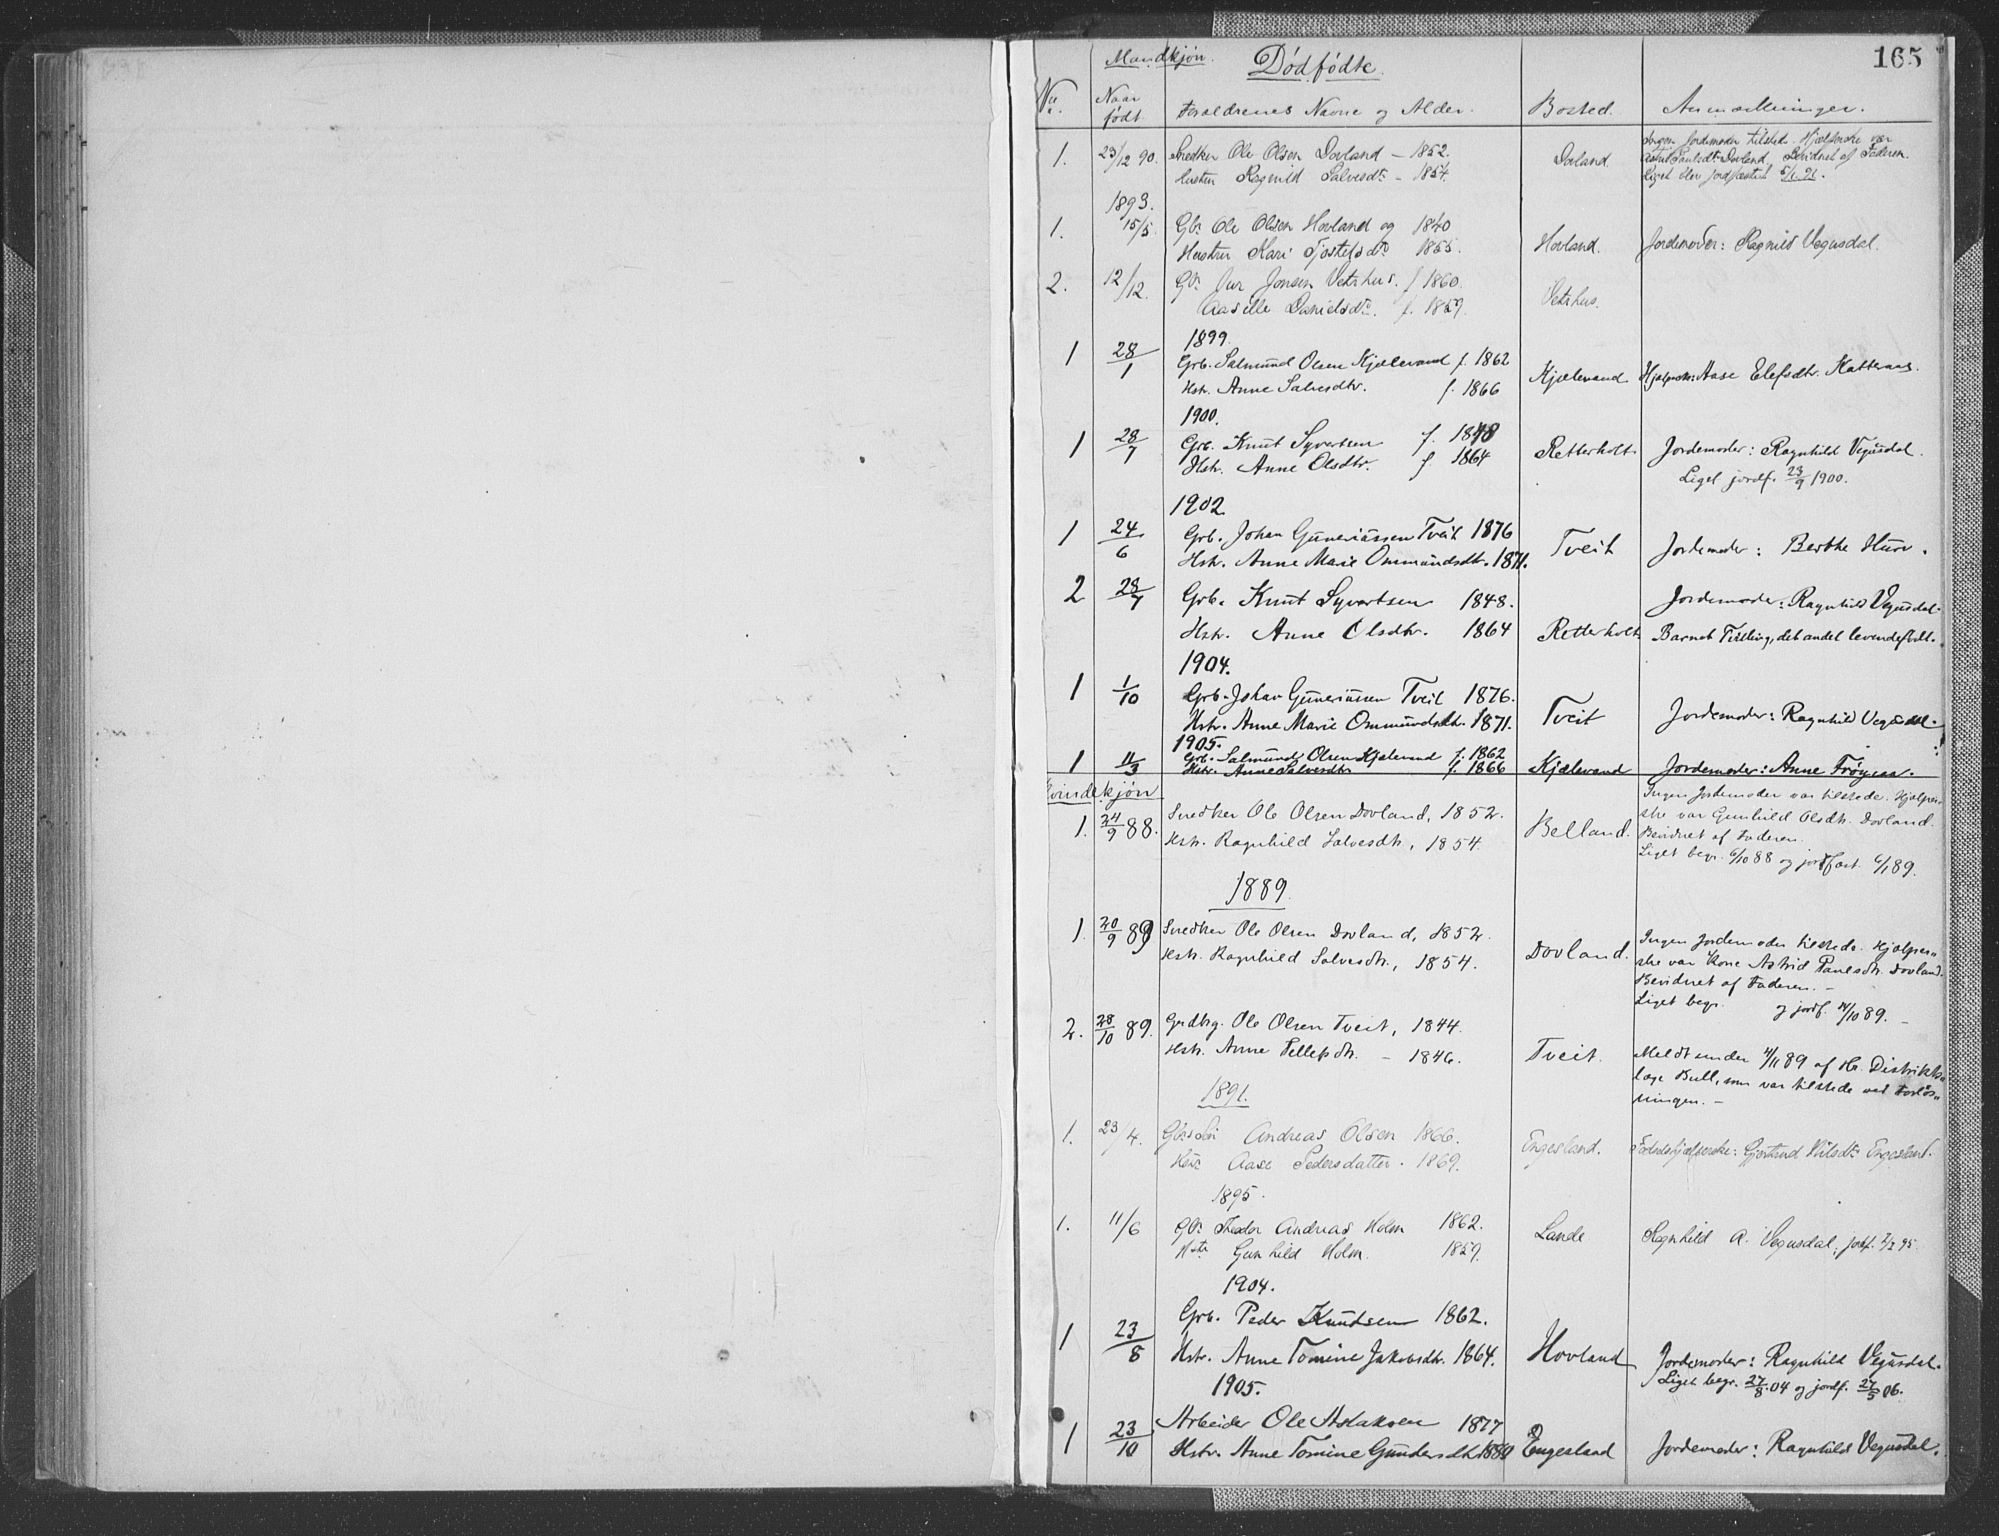 SAK, Herefoss sokneprestkontor, F/Fa/Fab/L0004: Ministerialbok nr. A 4, 1887-1909, s. 165